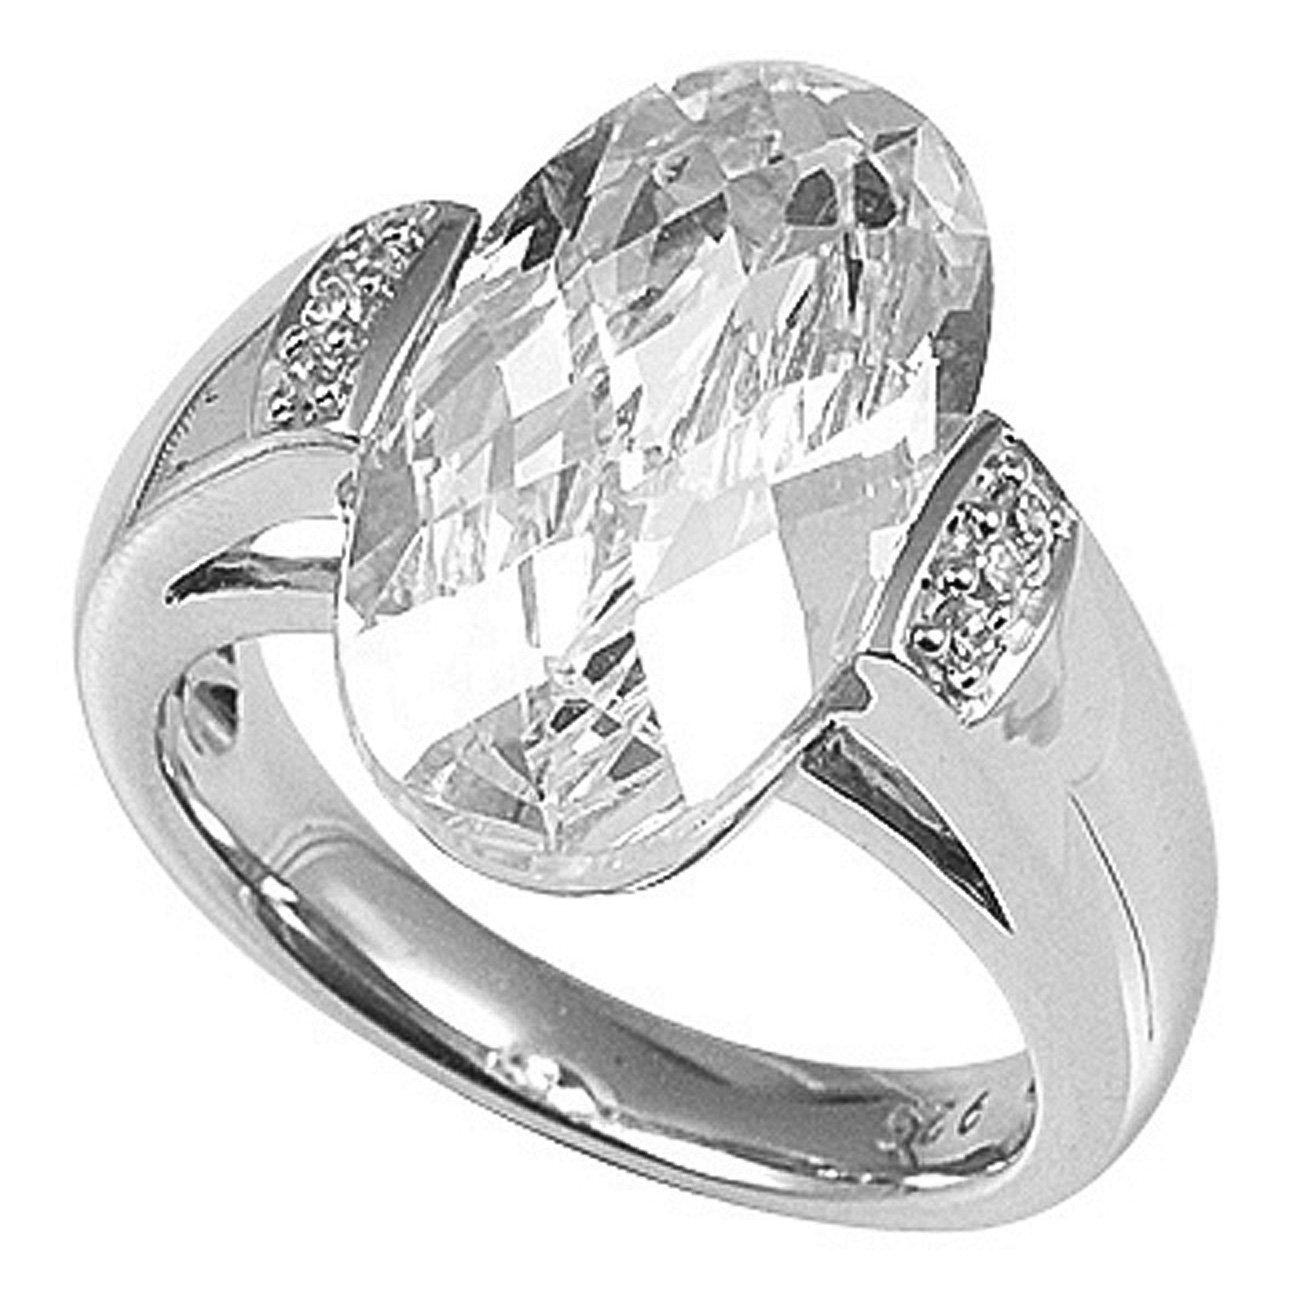 bei Uhrcenter: merii M0202R Silber Damen-Ring - Schmuck